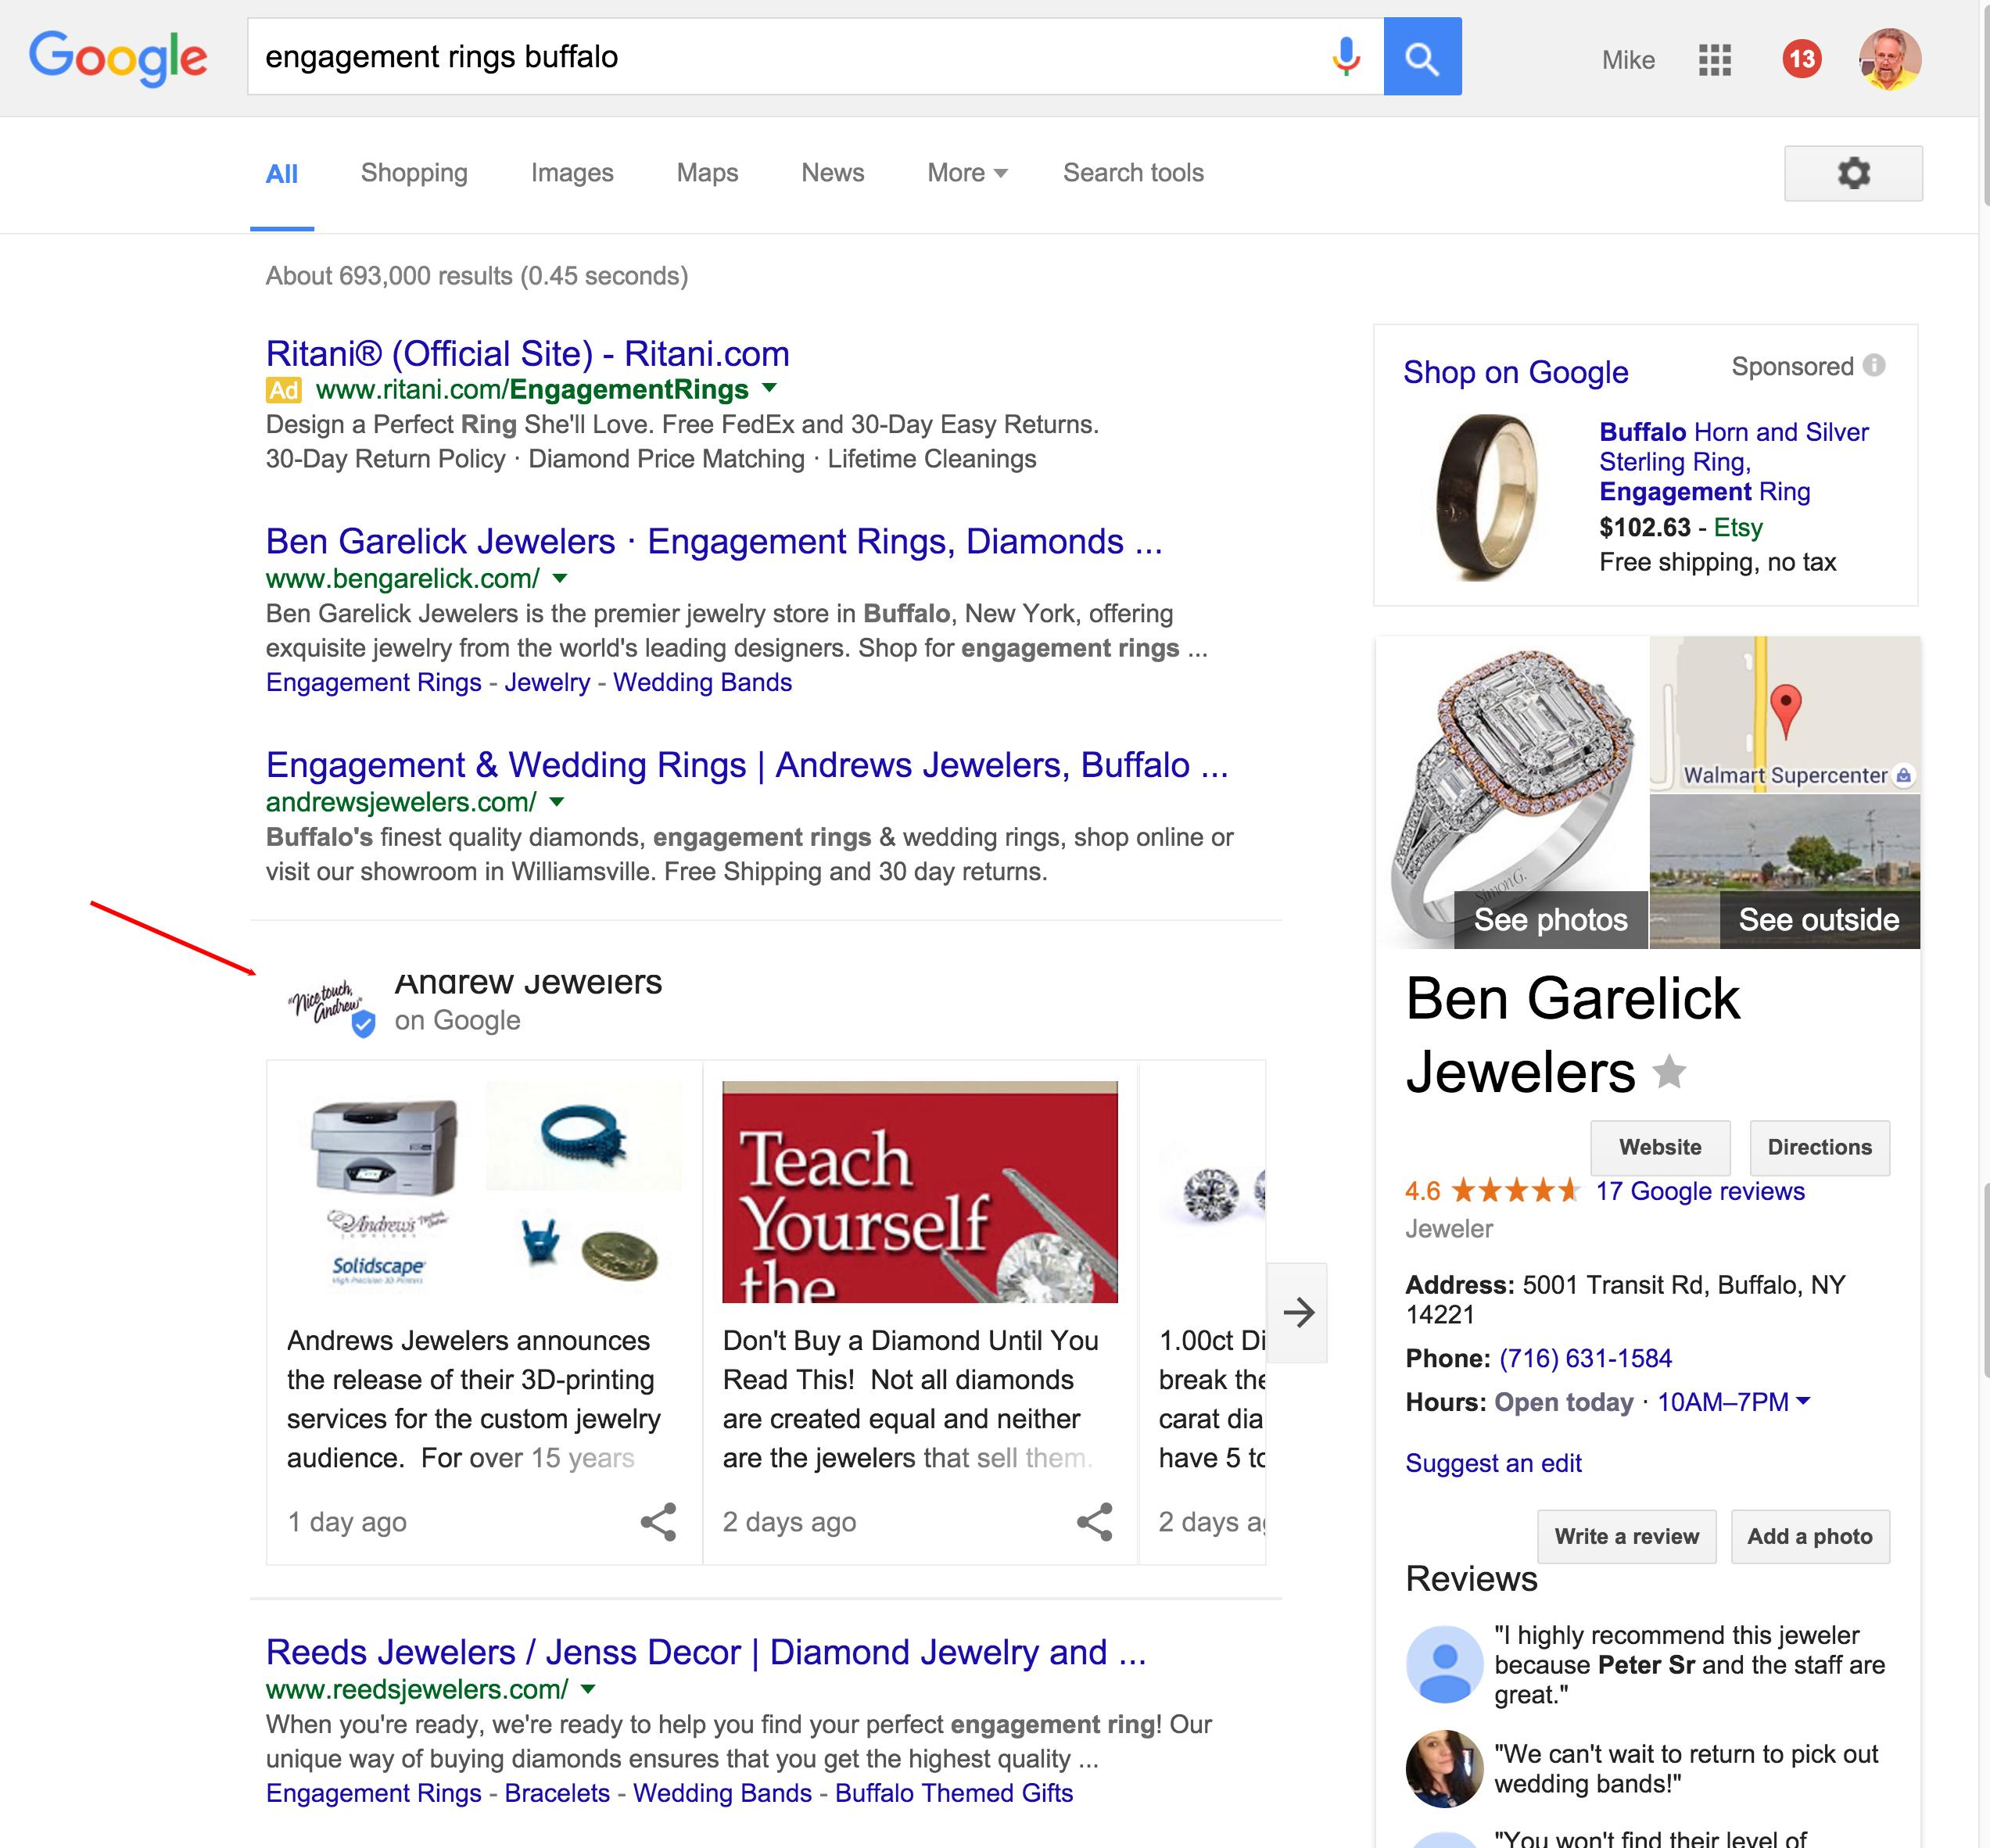 crop-engagement-rings-buffalo---Google-Search